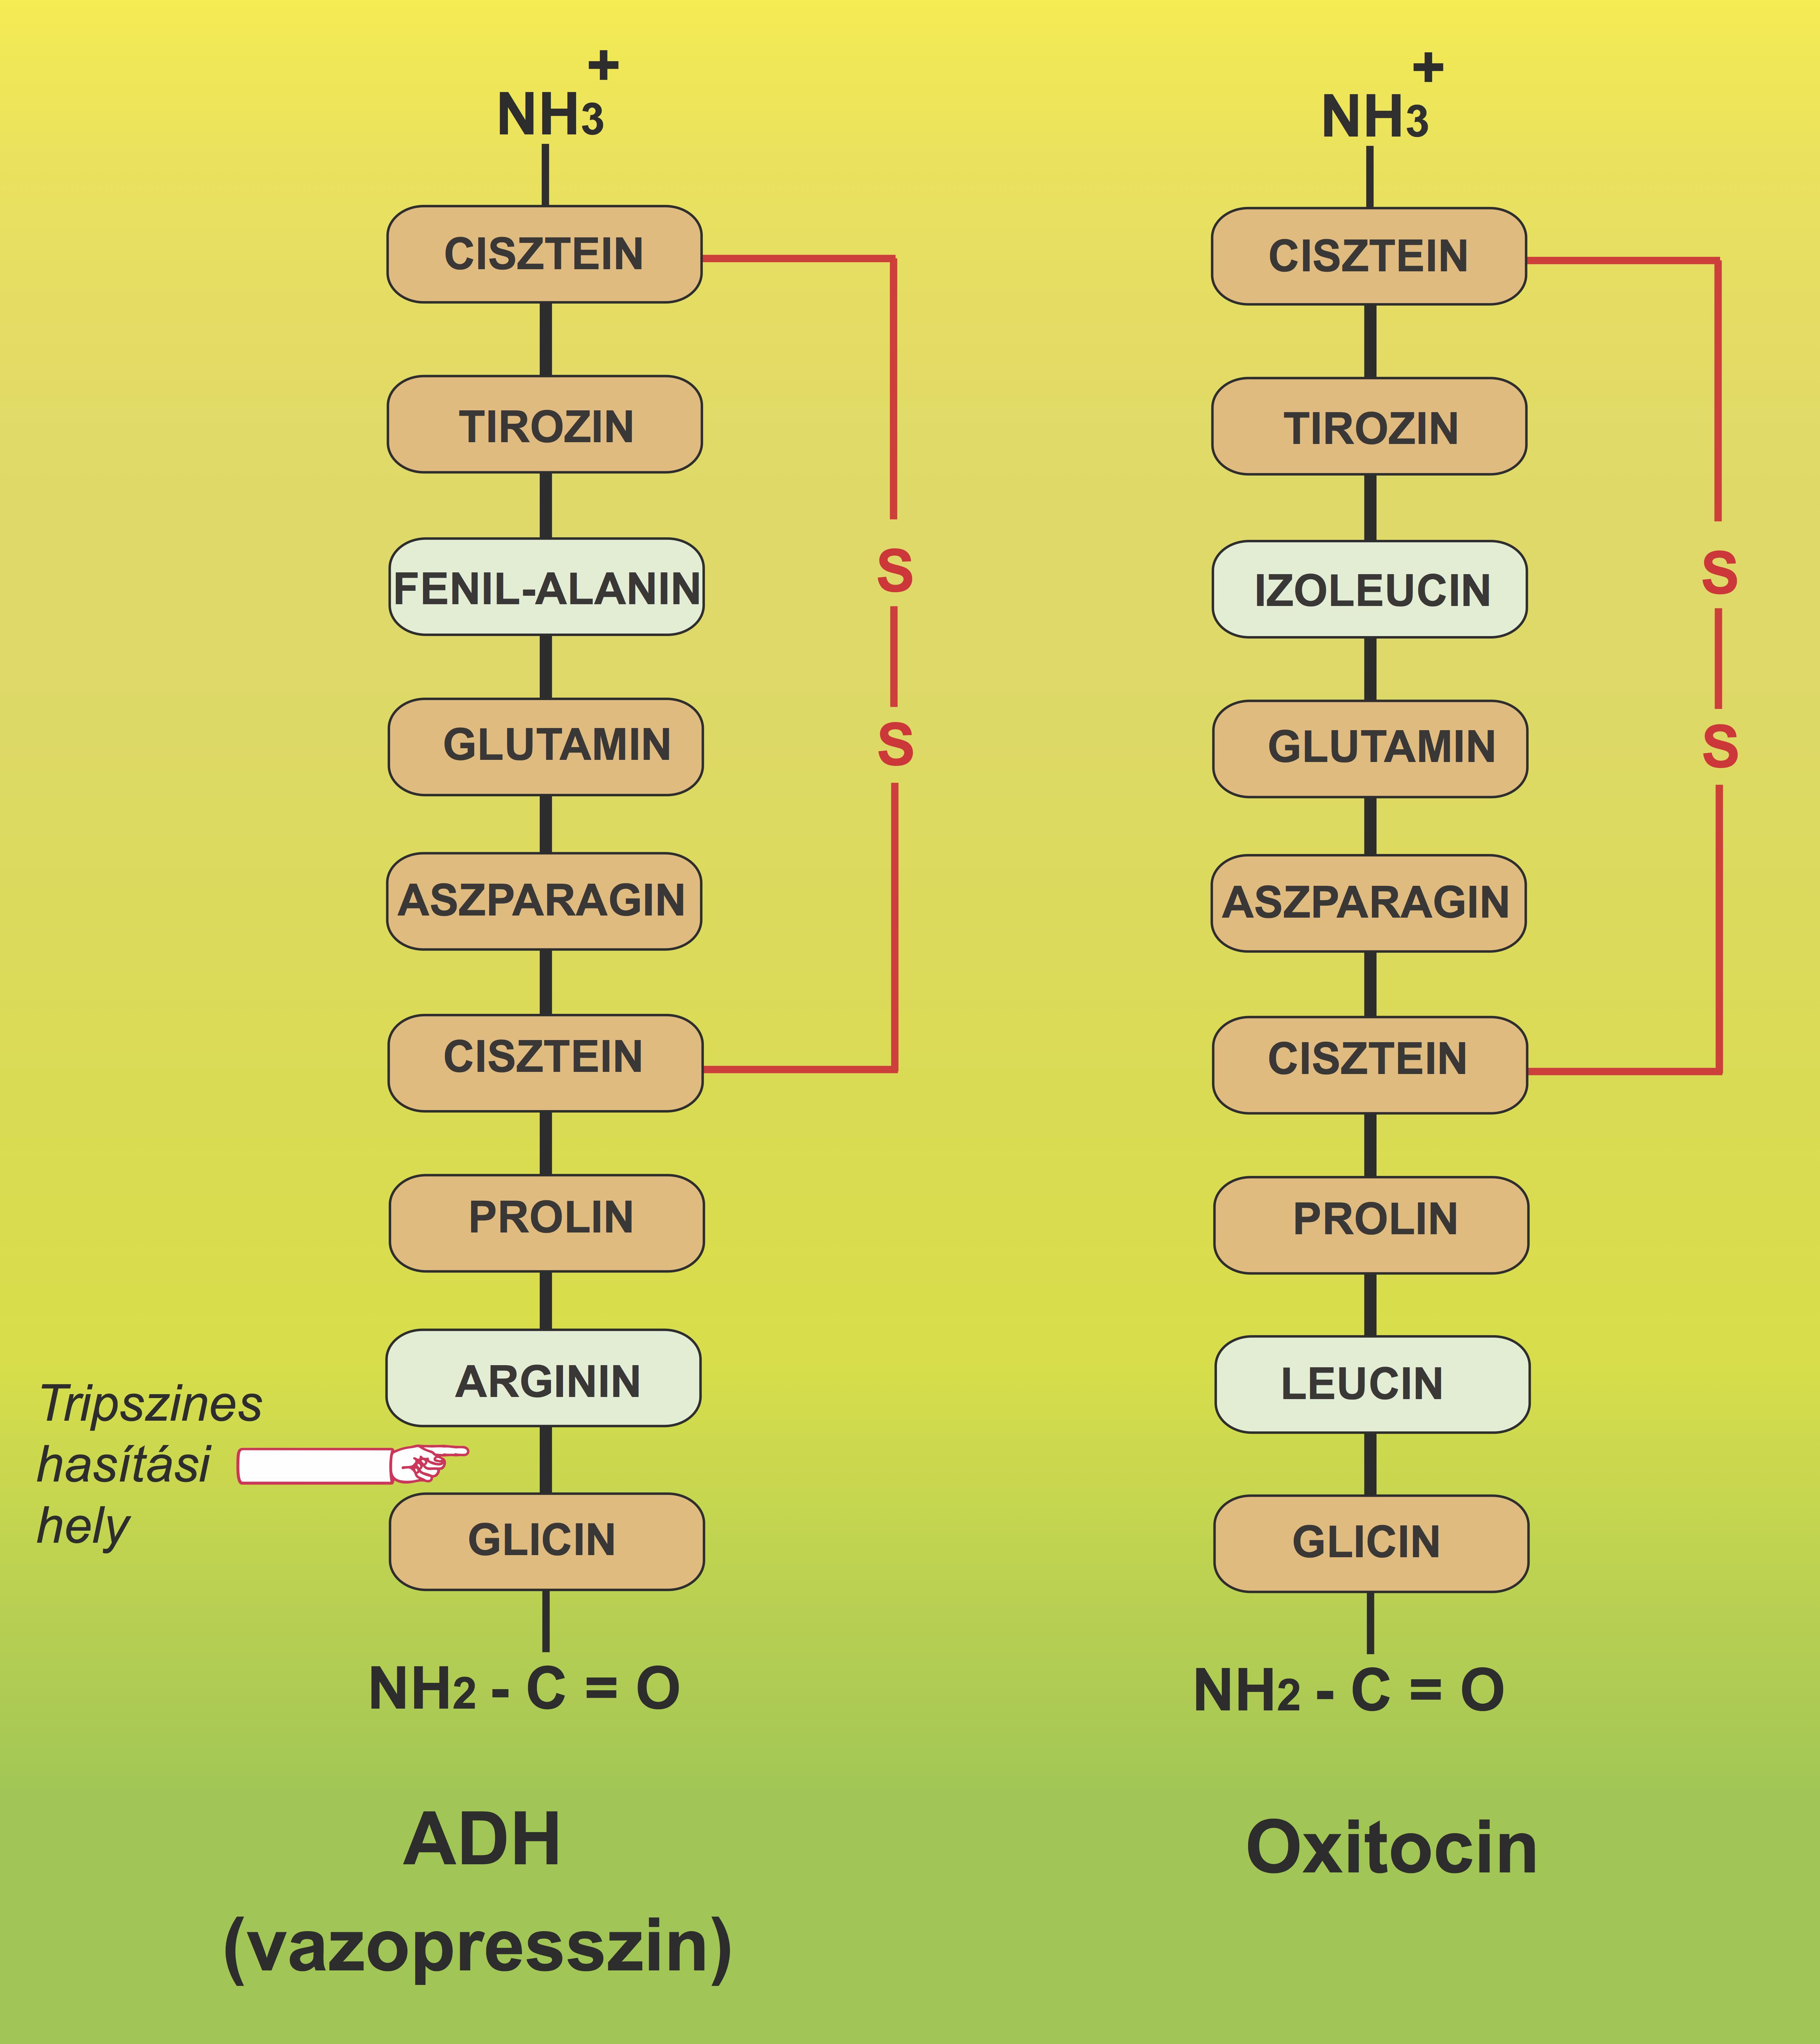 glicin-erekció)